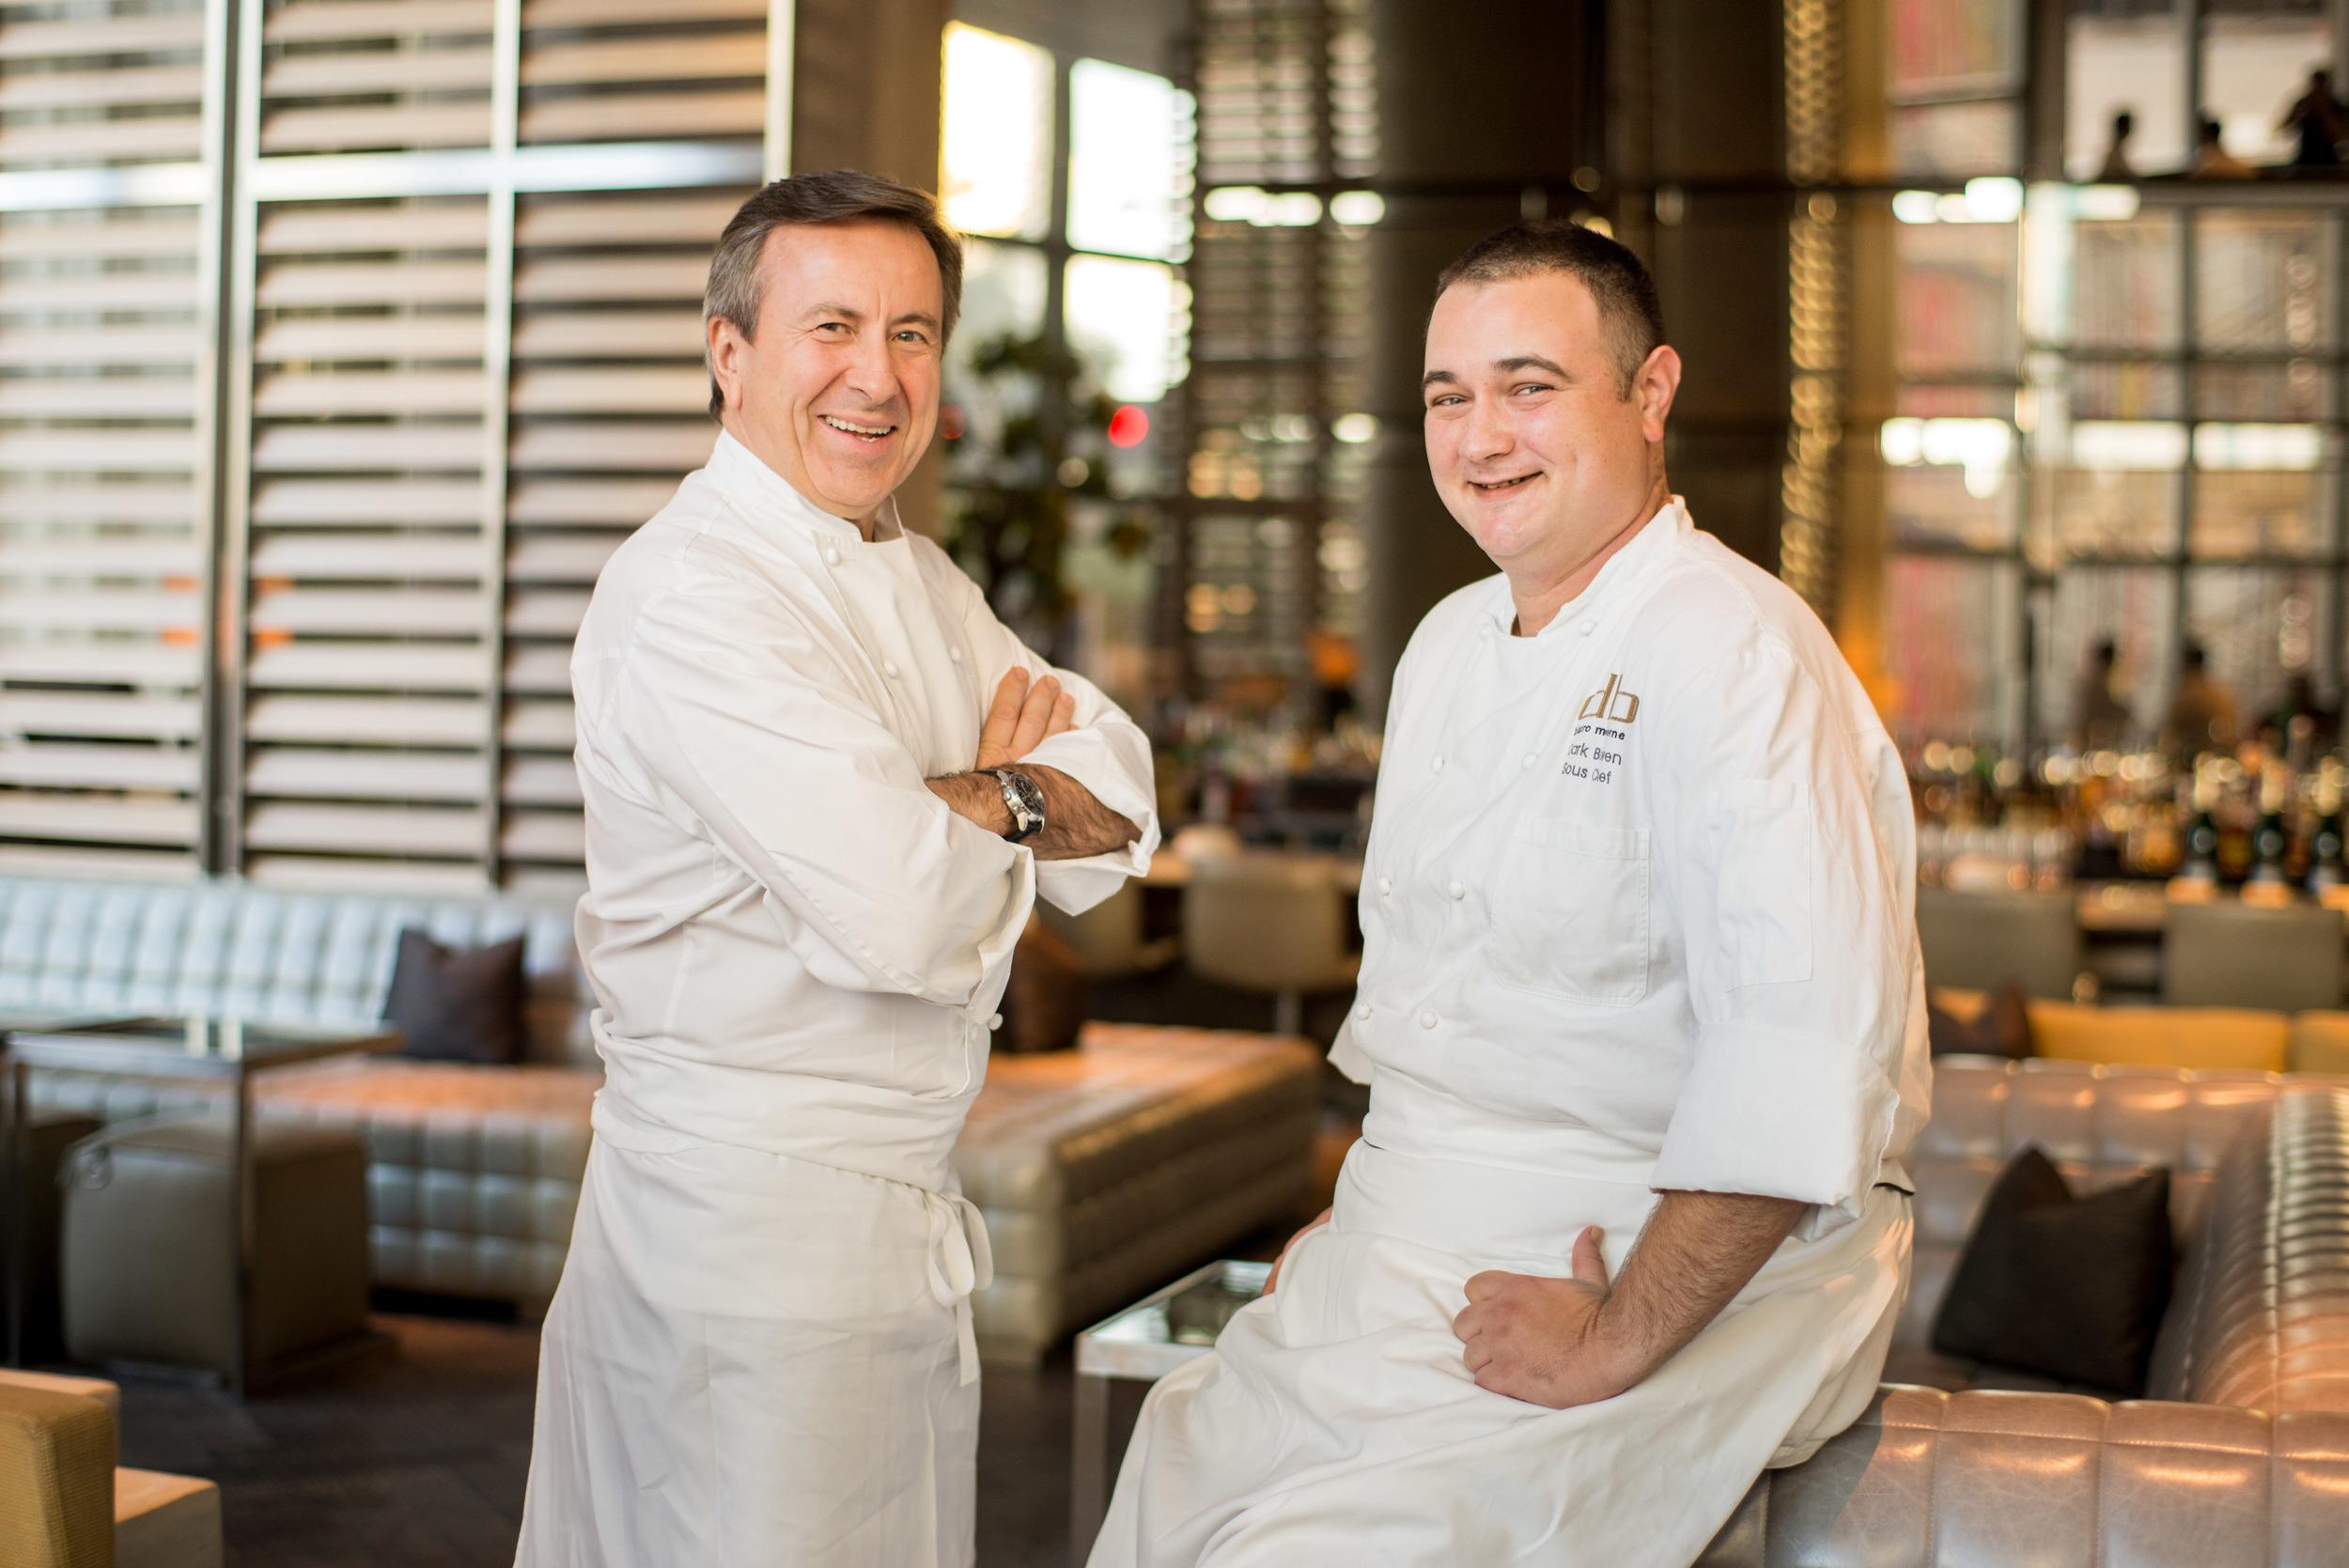 Daniel Boulud Miami Chef Clark Bowen